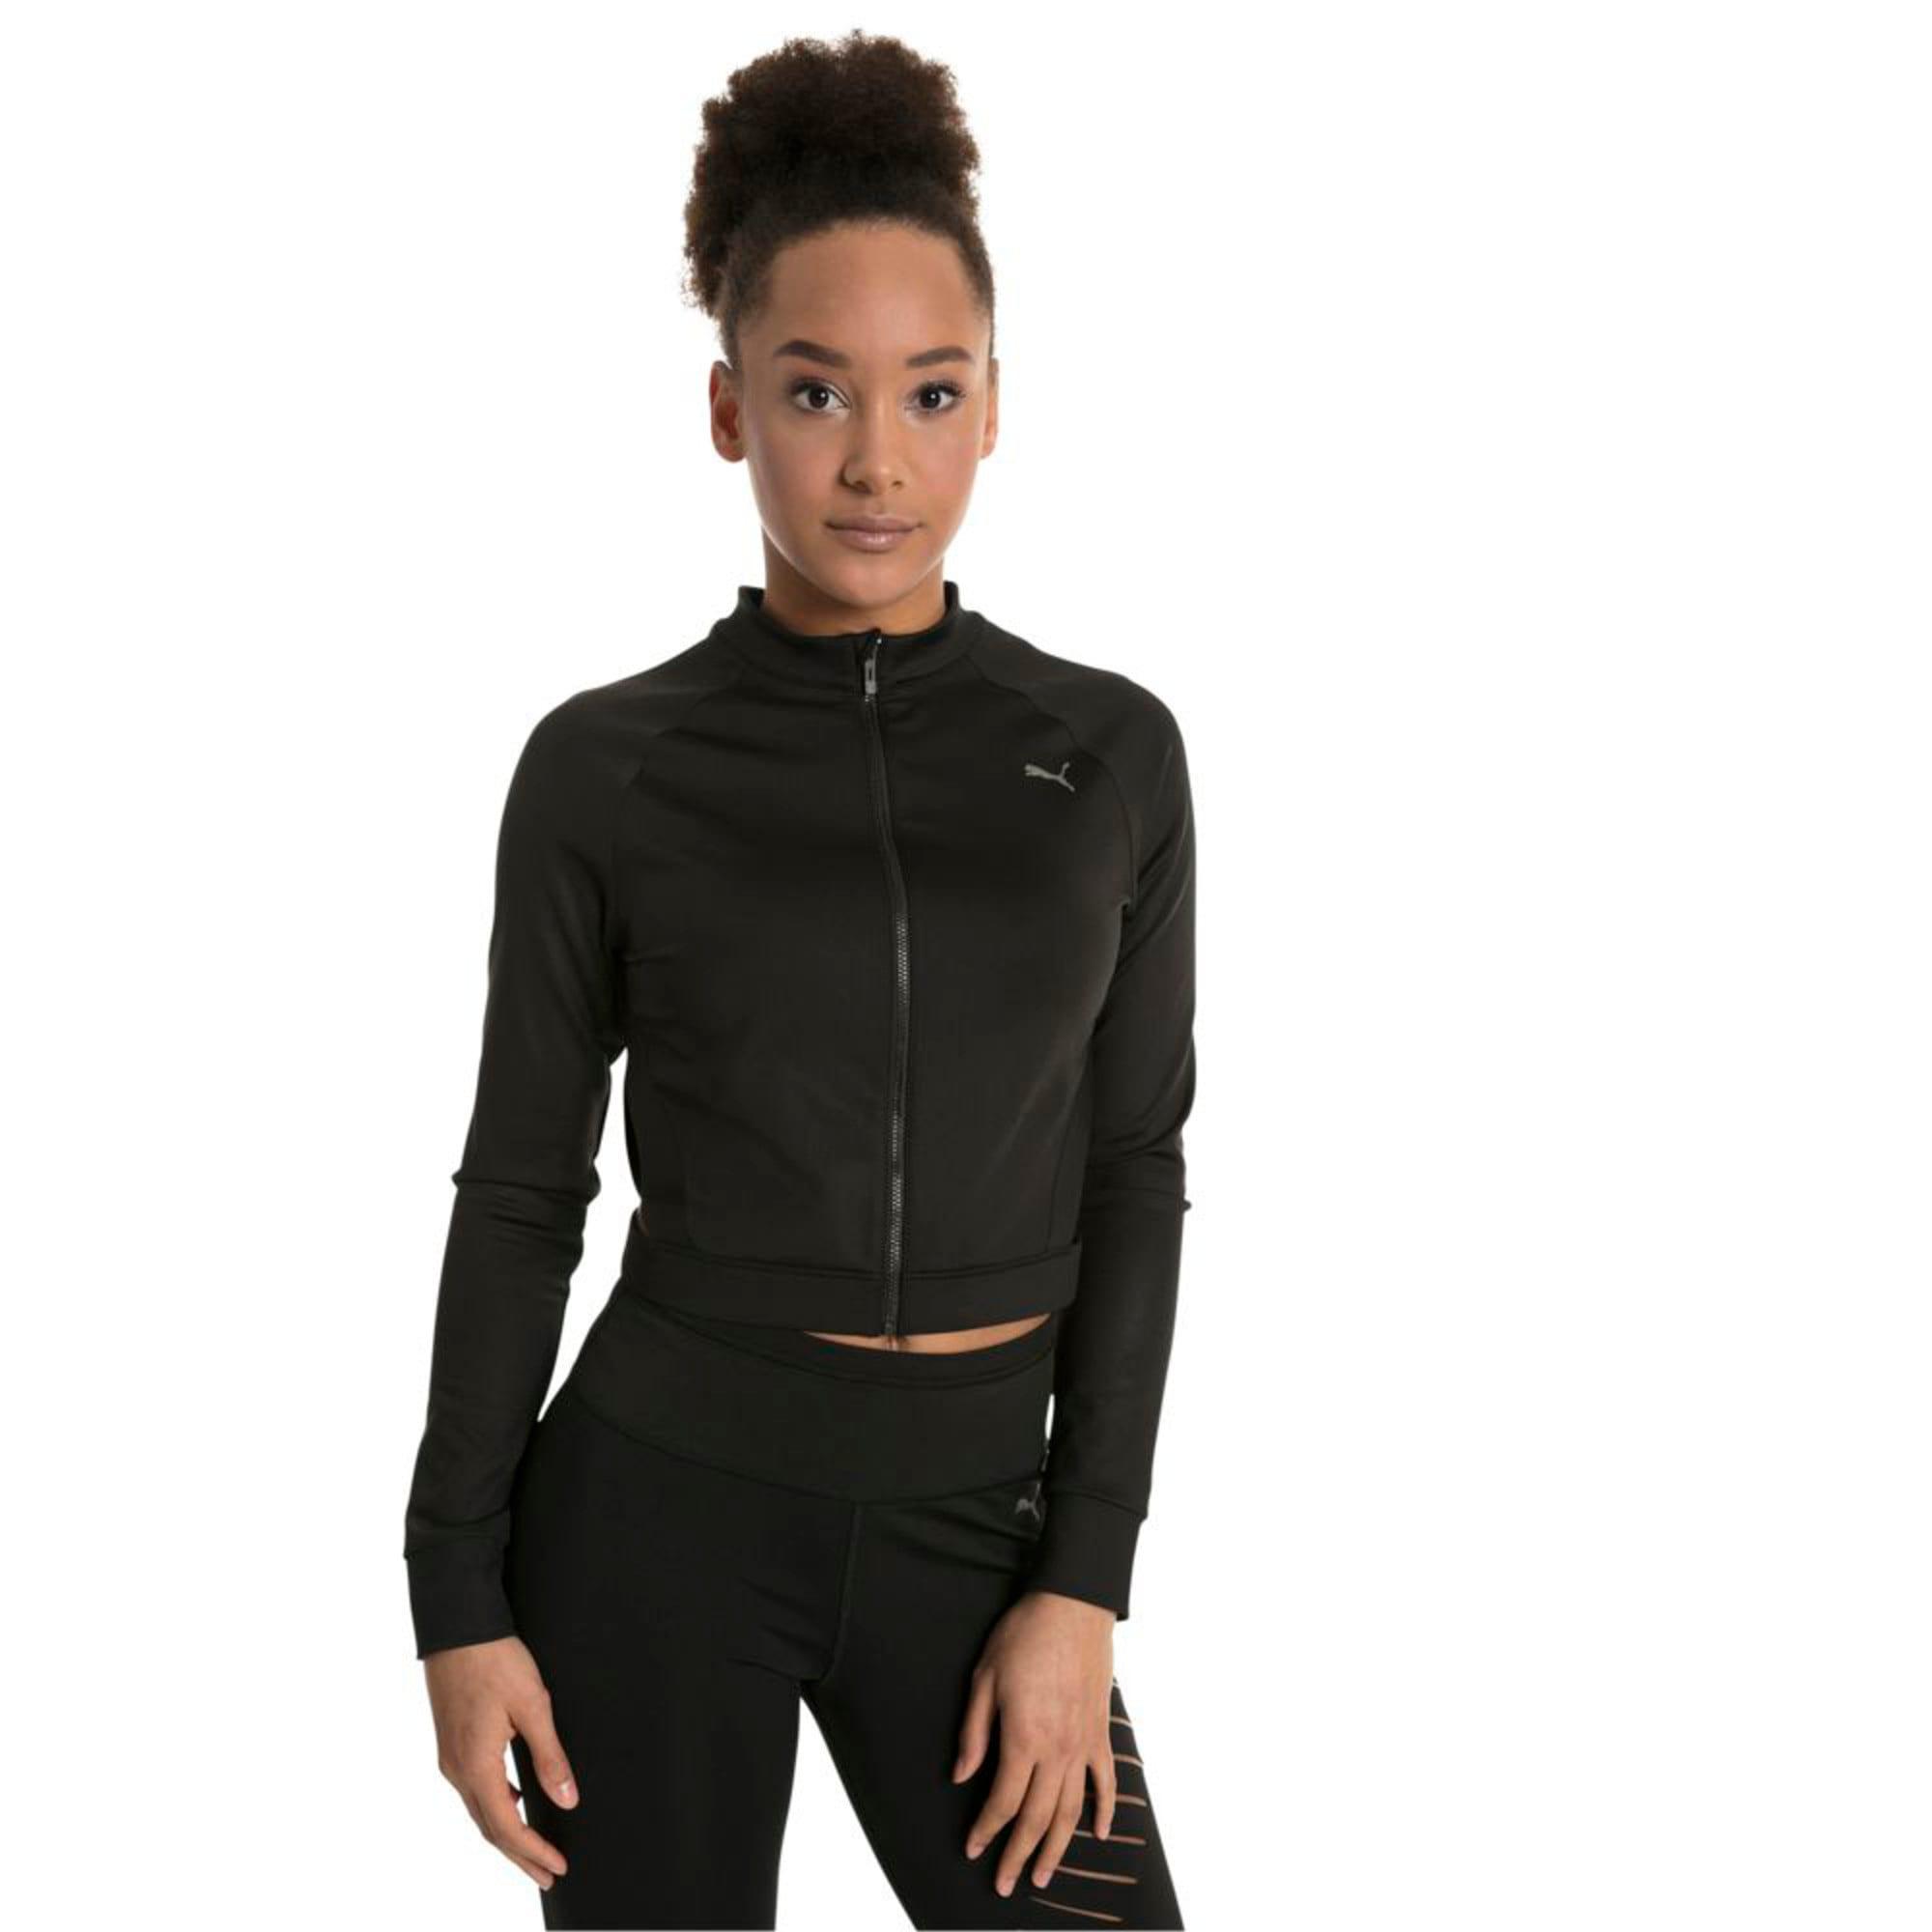 Thumbnail 1 of Explosive Cut-Out Women's Jacket, Puma Black, medium-IND